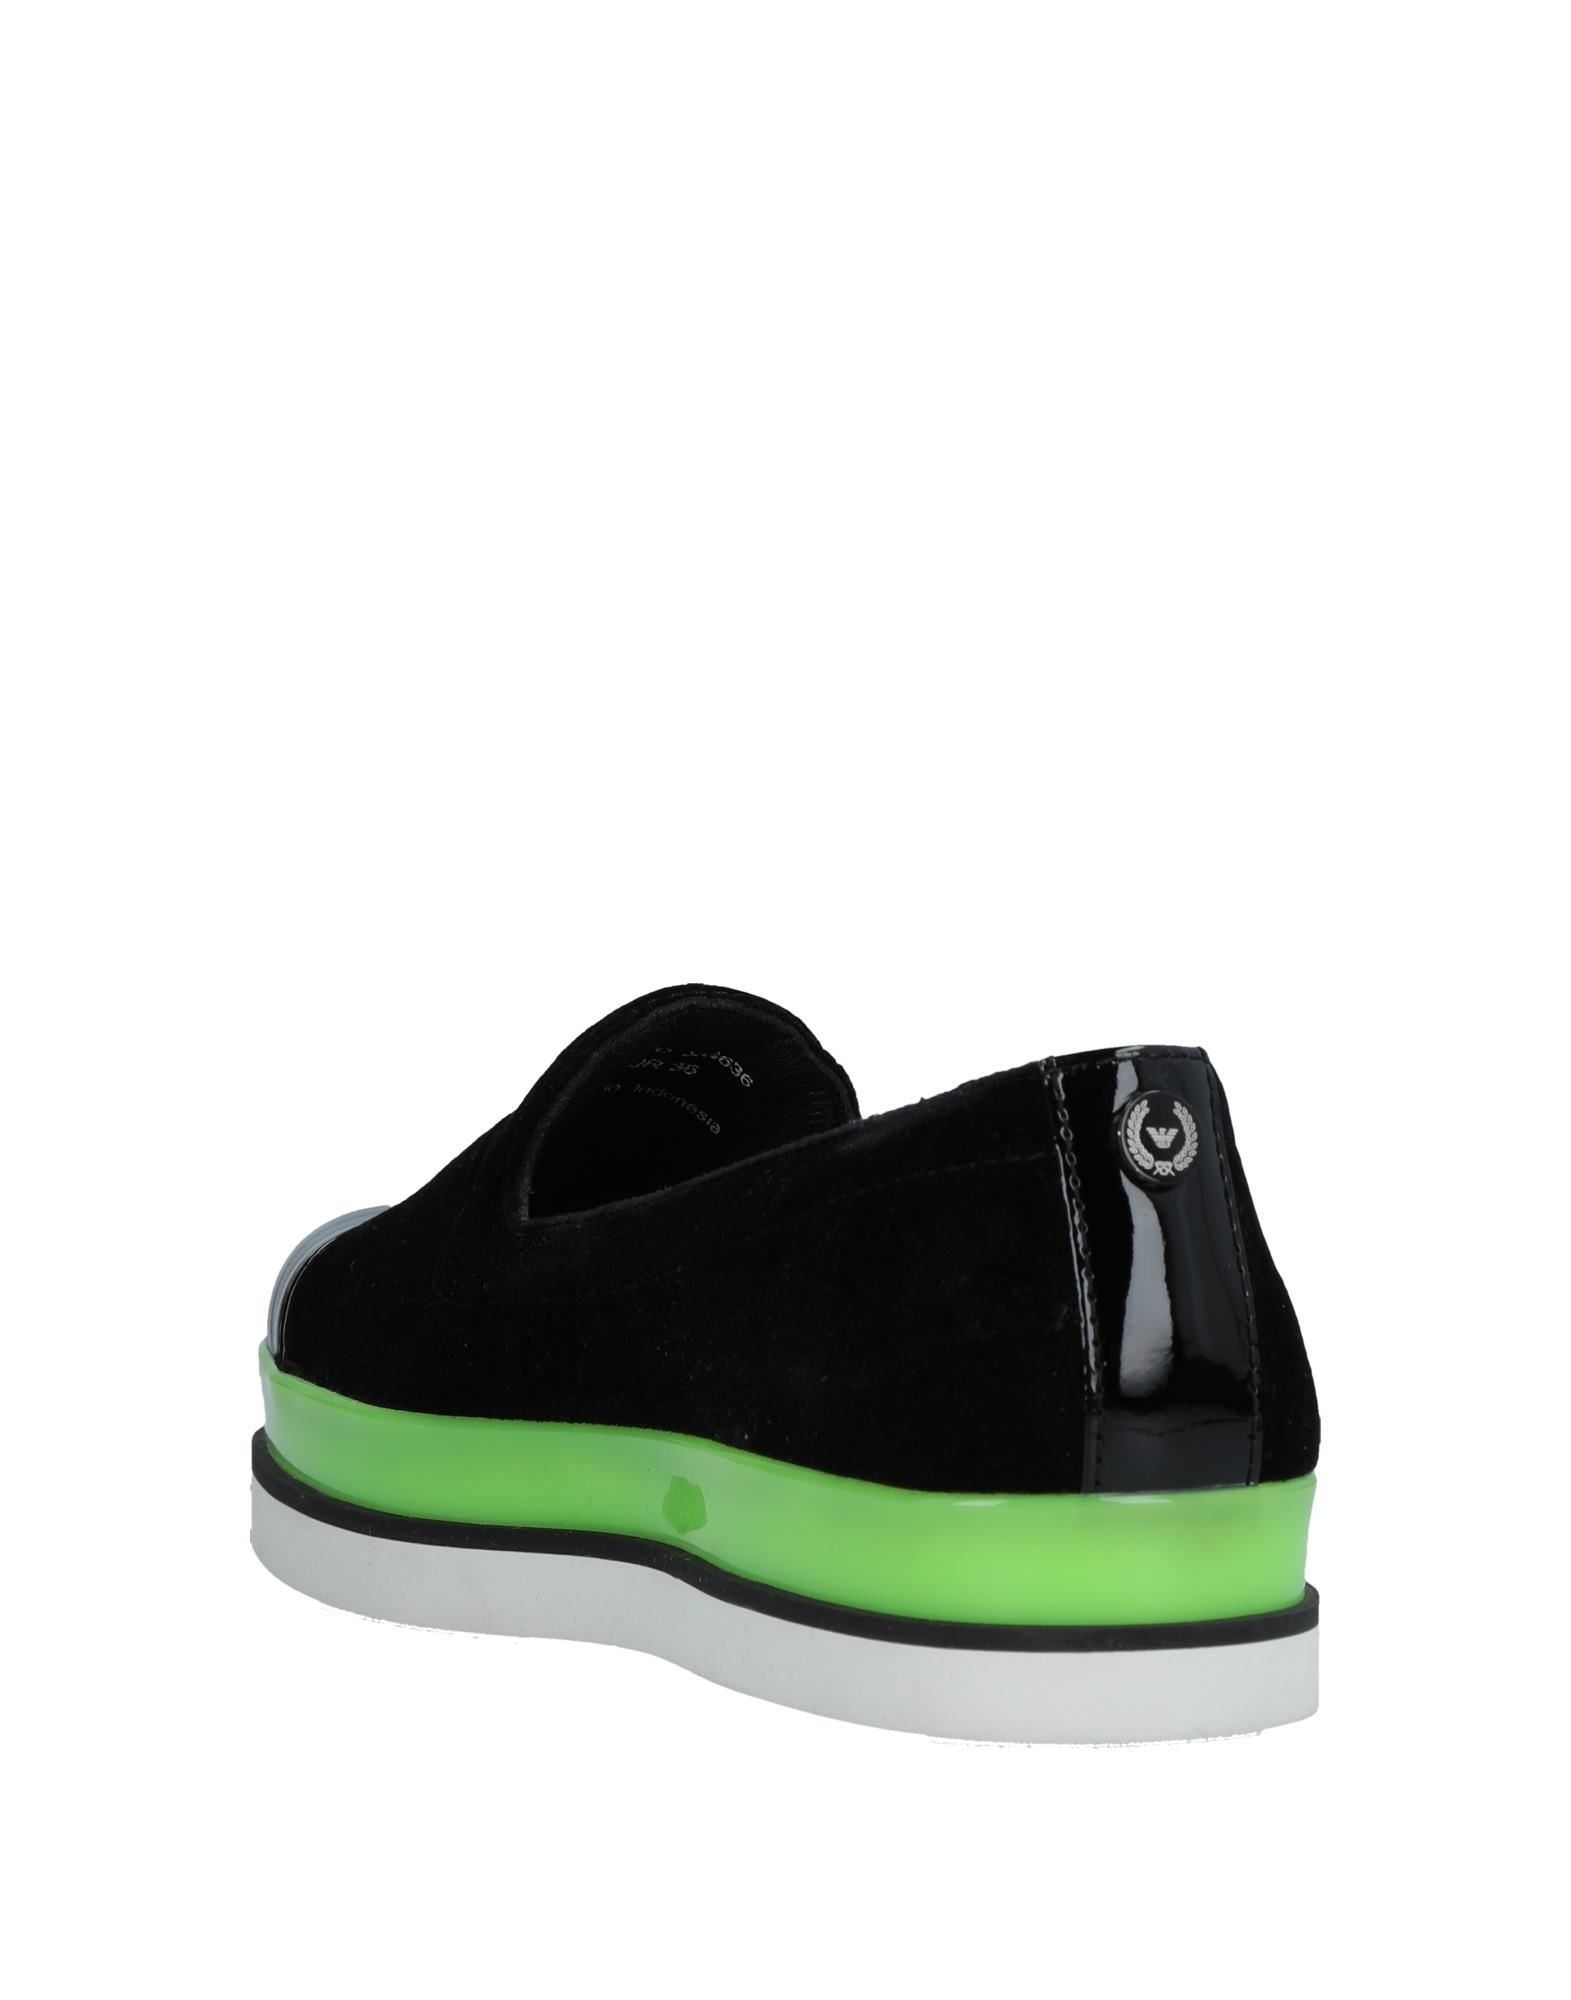 Stilvolle billige Schuhe Emporio  Armani Mokassins Damen  Emporio 11451169SP 8e9536